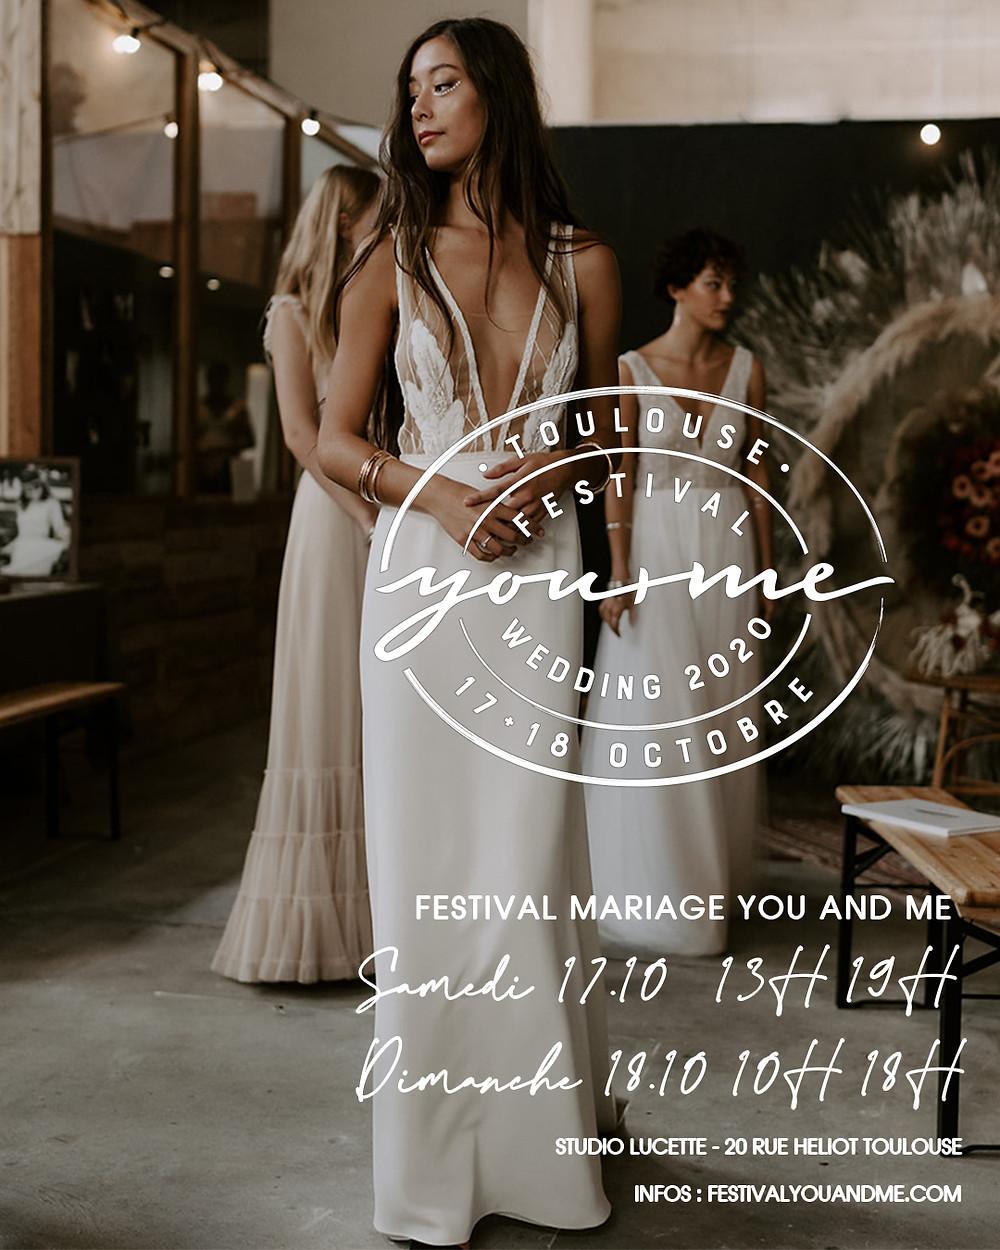 Festival mariage Toulouse 17+18 octobre 2020